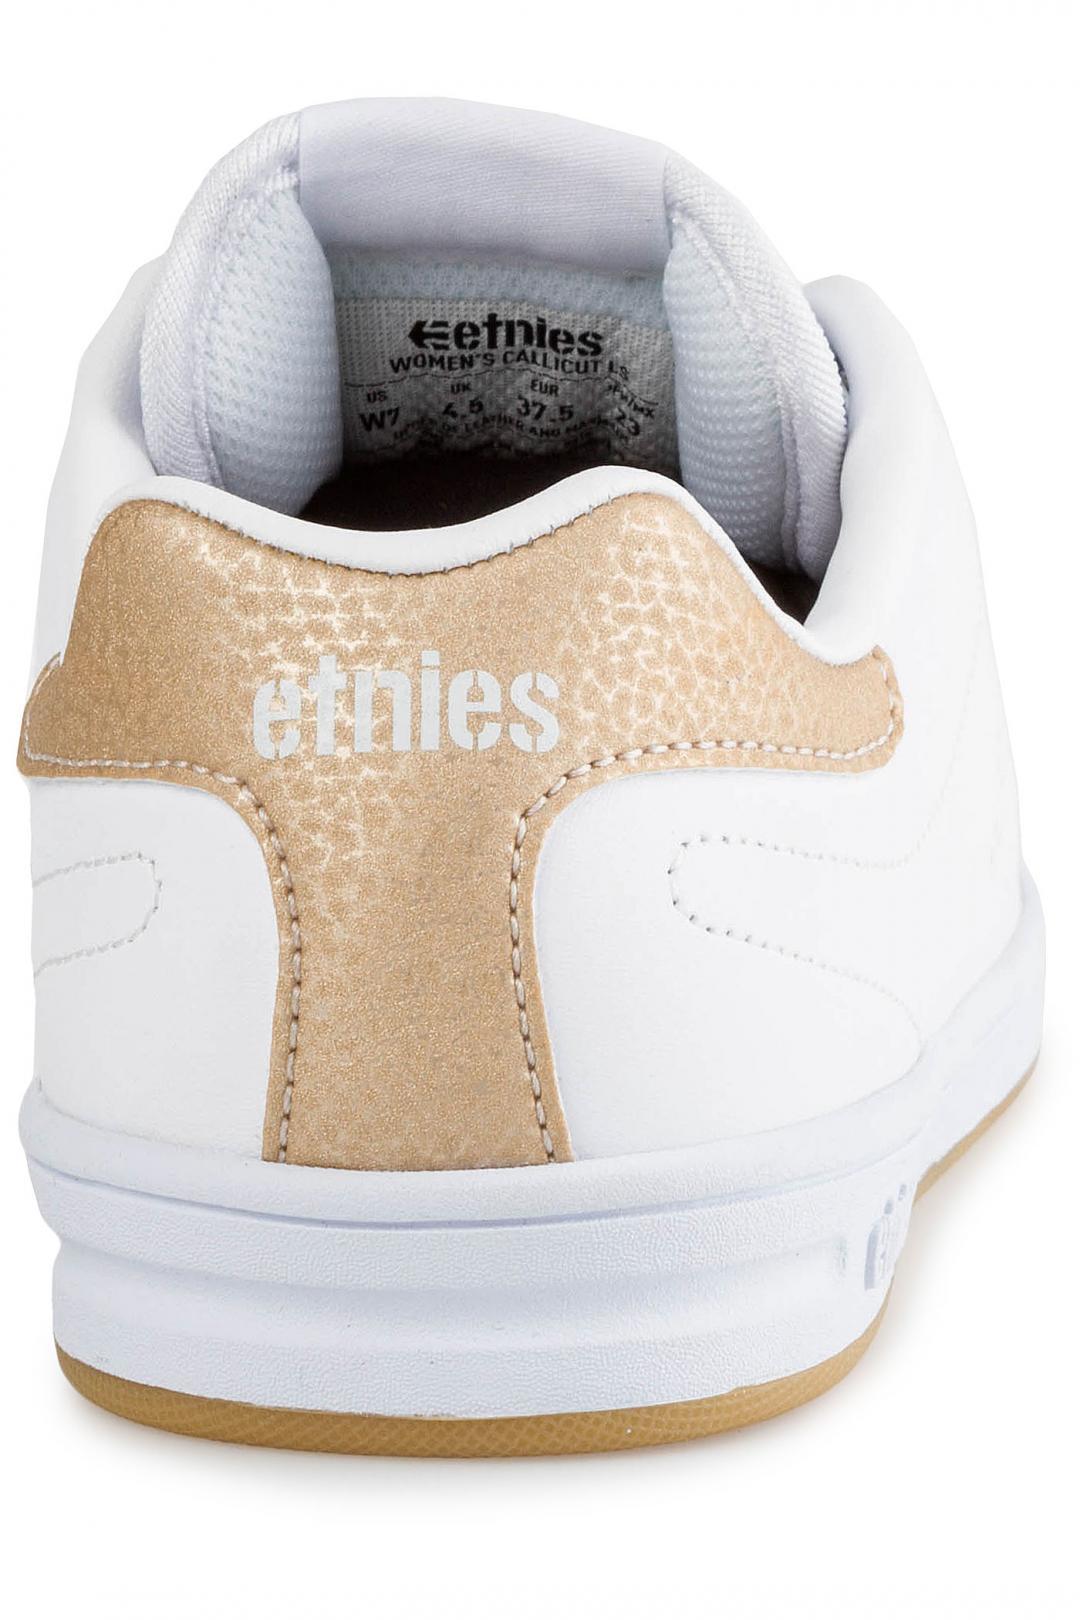 Donna Etnies Callicut LS white pink   Scarpe da skate